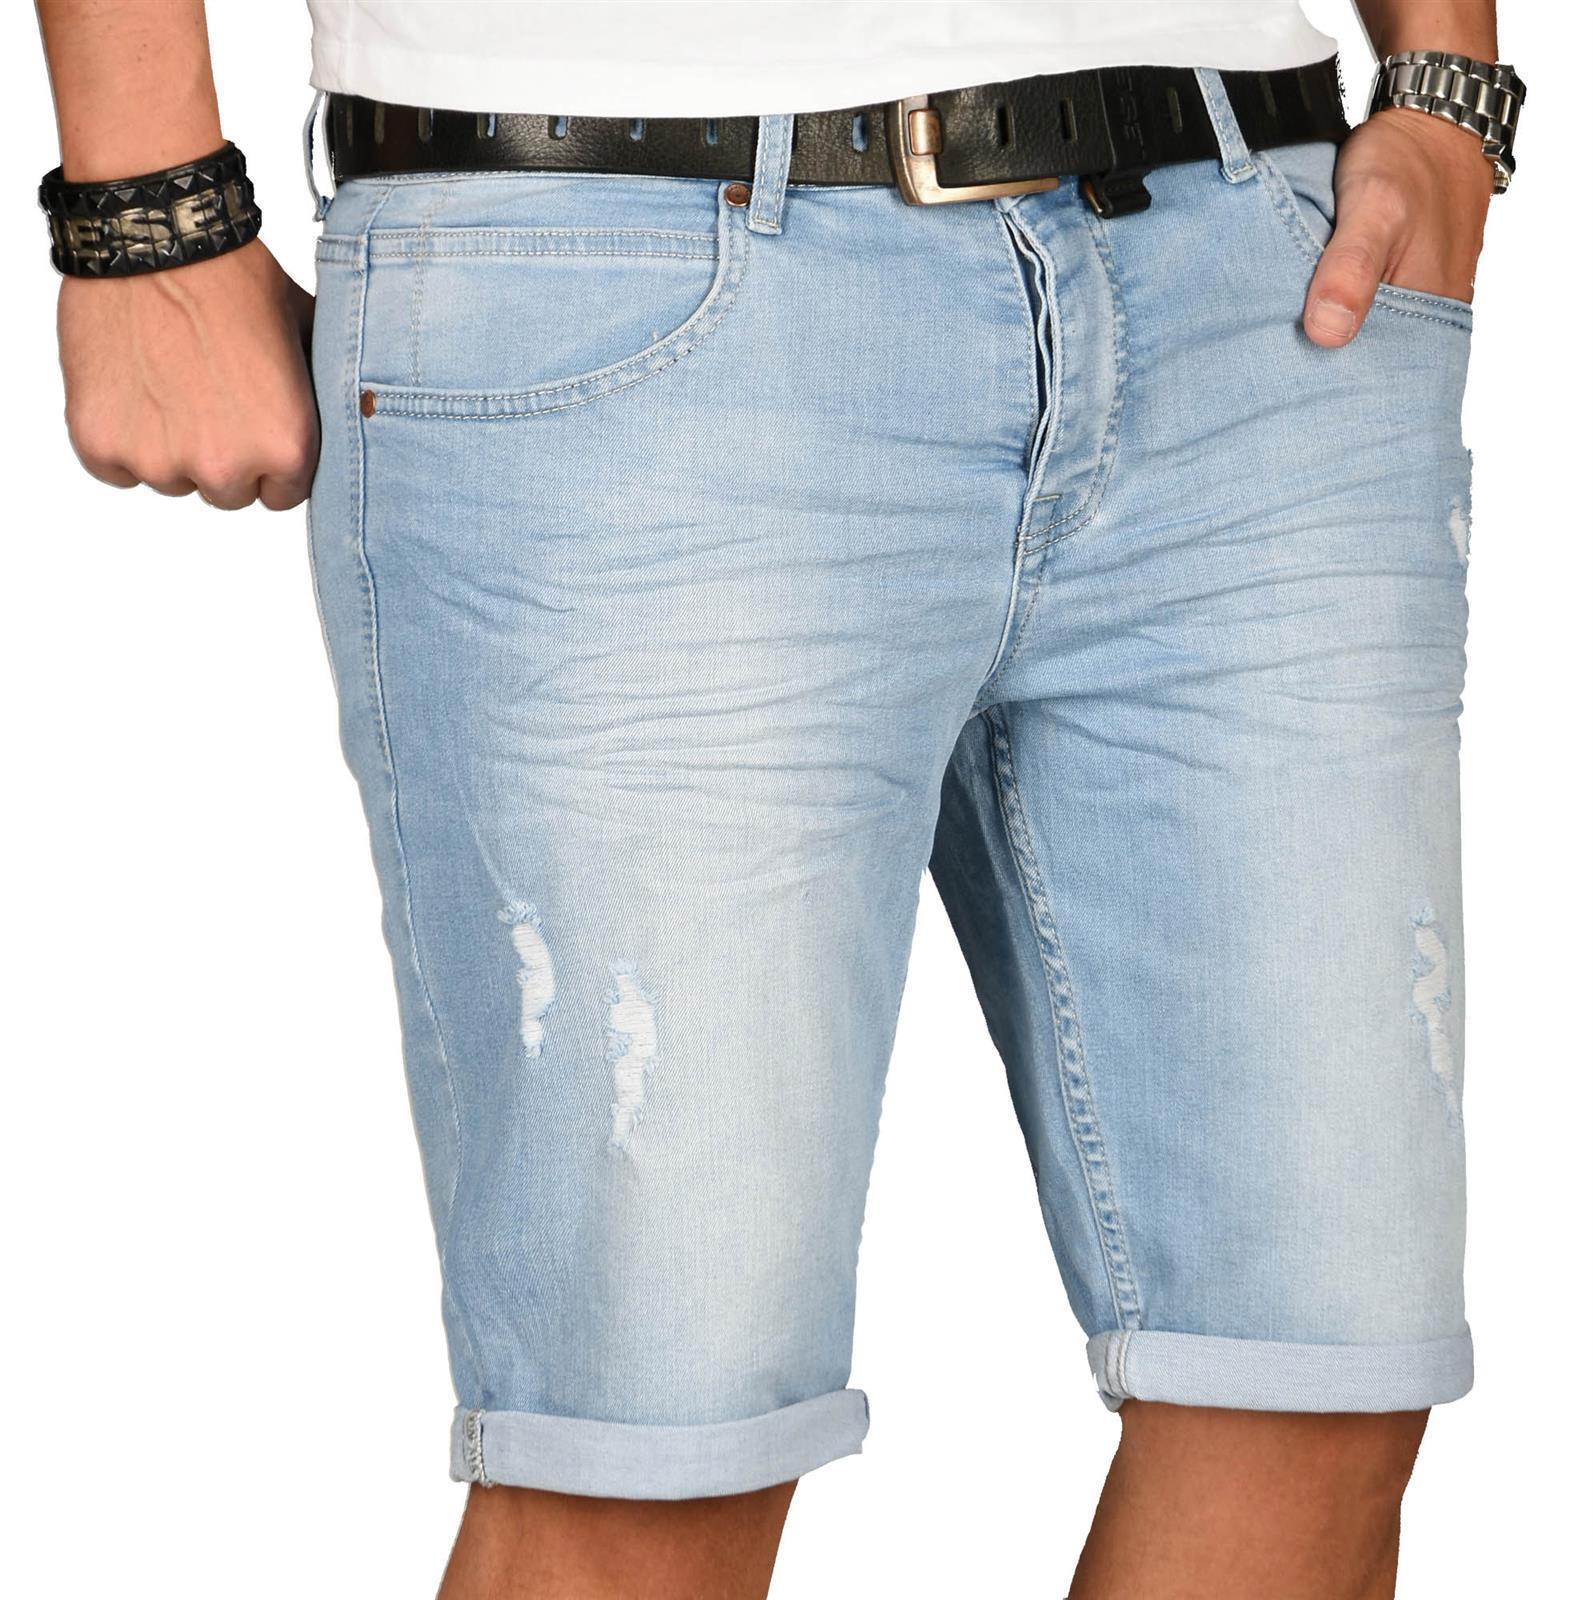 A-Salvarini-Herren-Designer-Jeans-Short-kurze-Hose-Slim-Sommer-Shorts-Washed Indexbild 15